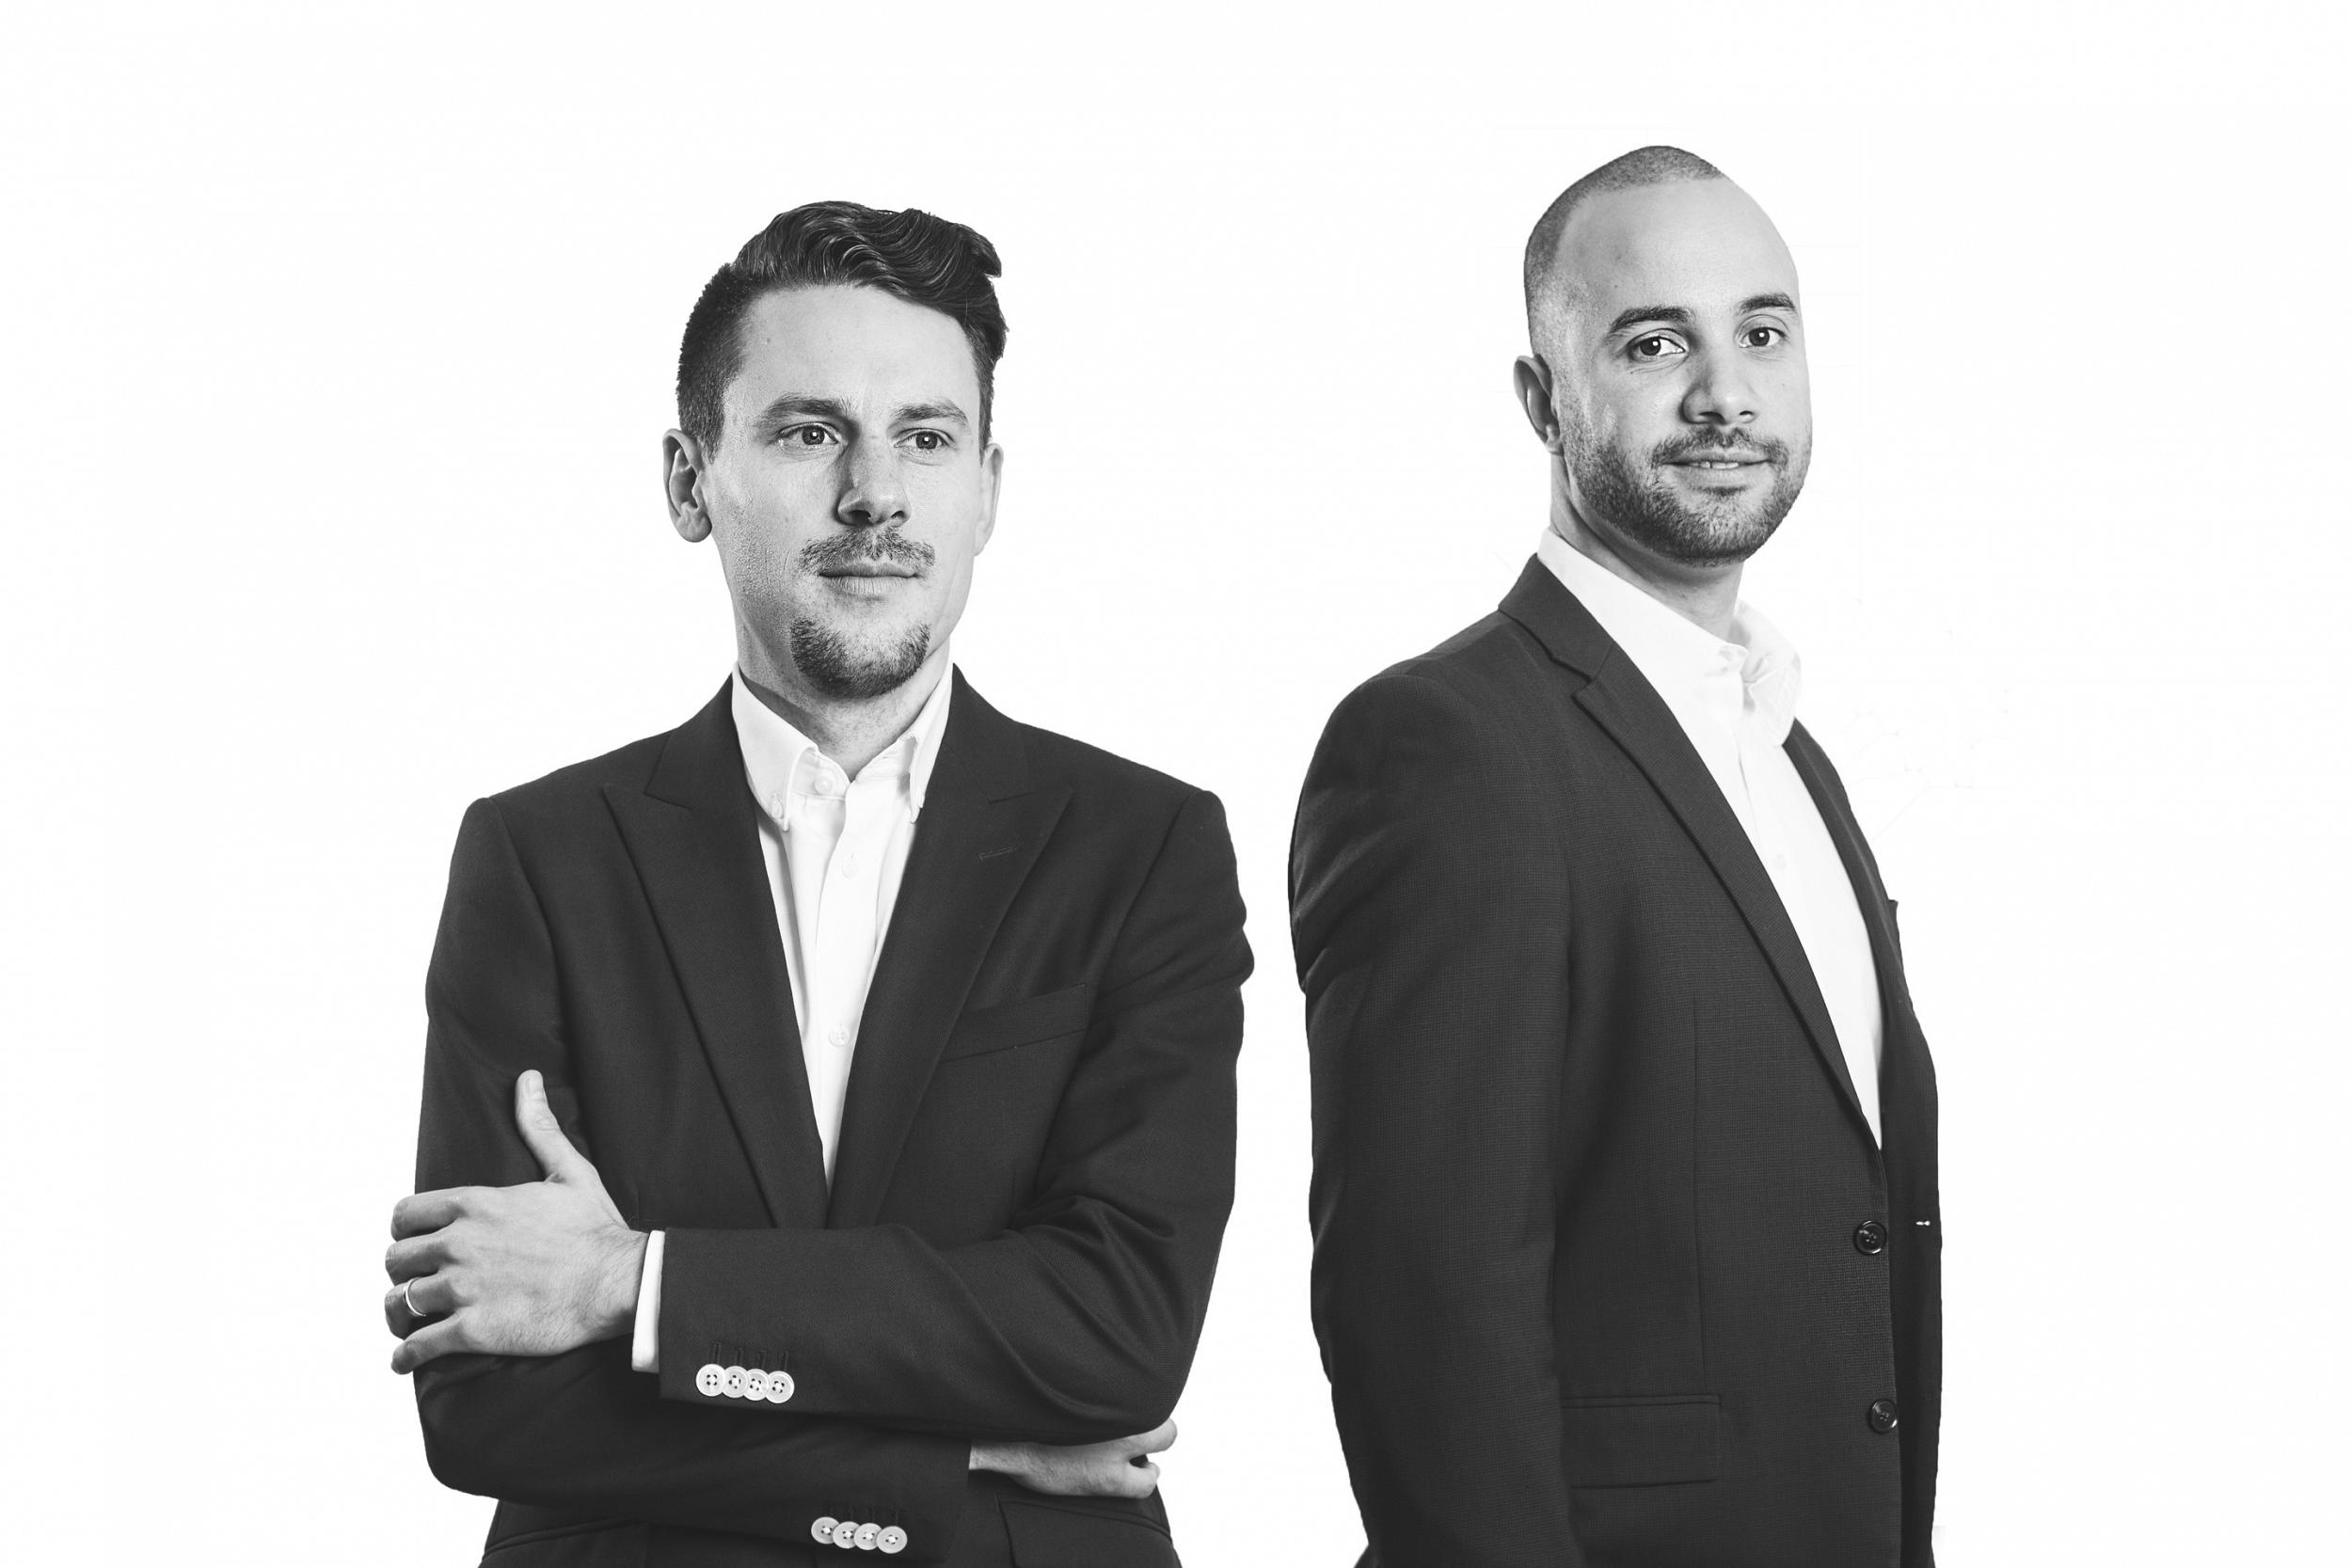 PwC Starts Partnership with Equity Crowdfunding Platform Companisto